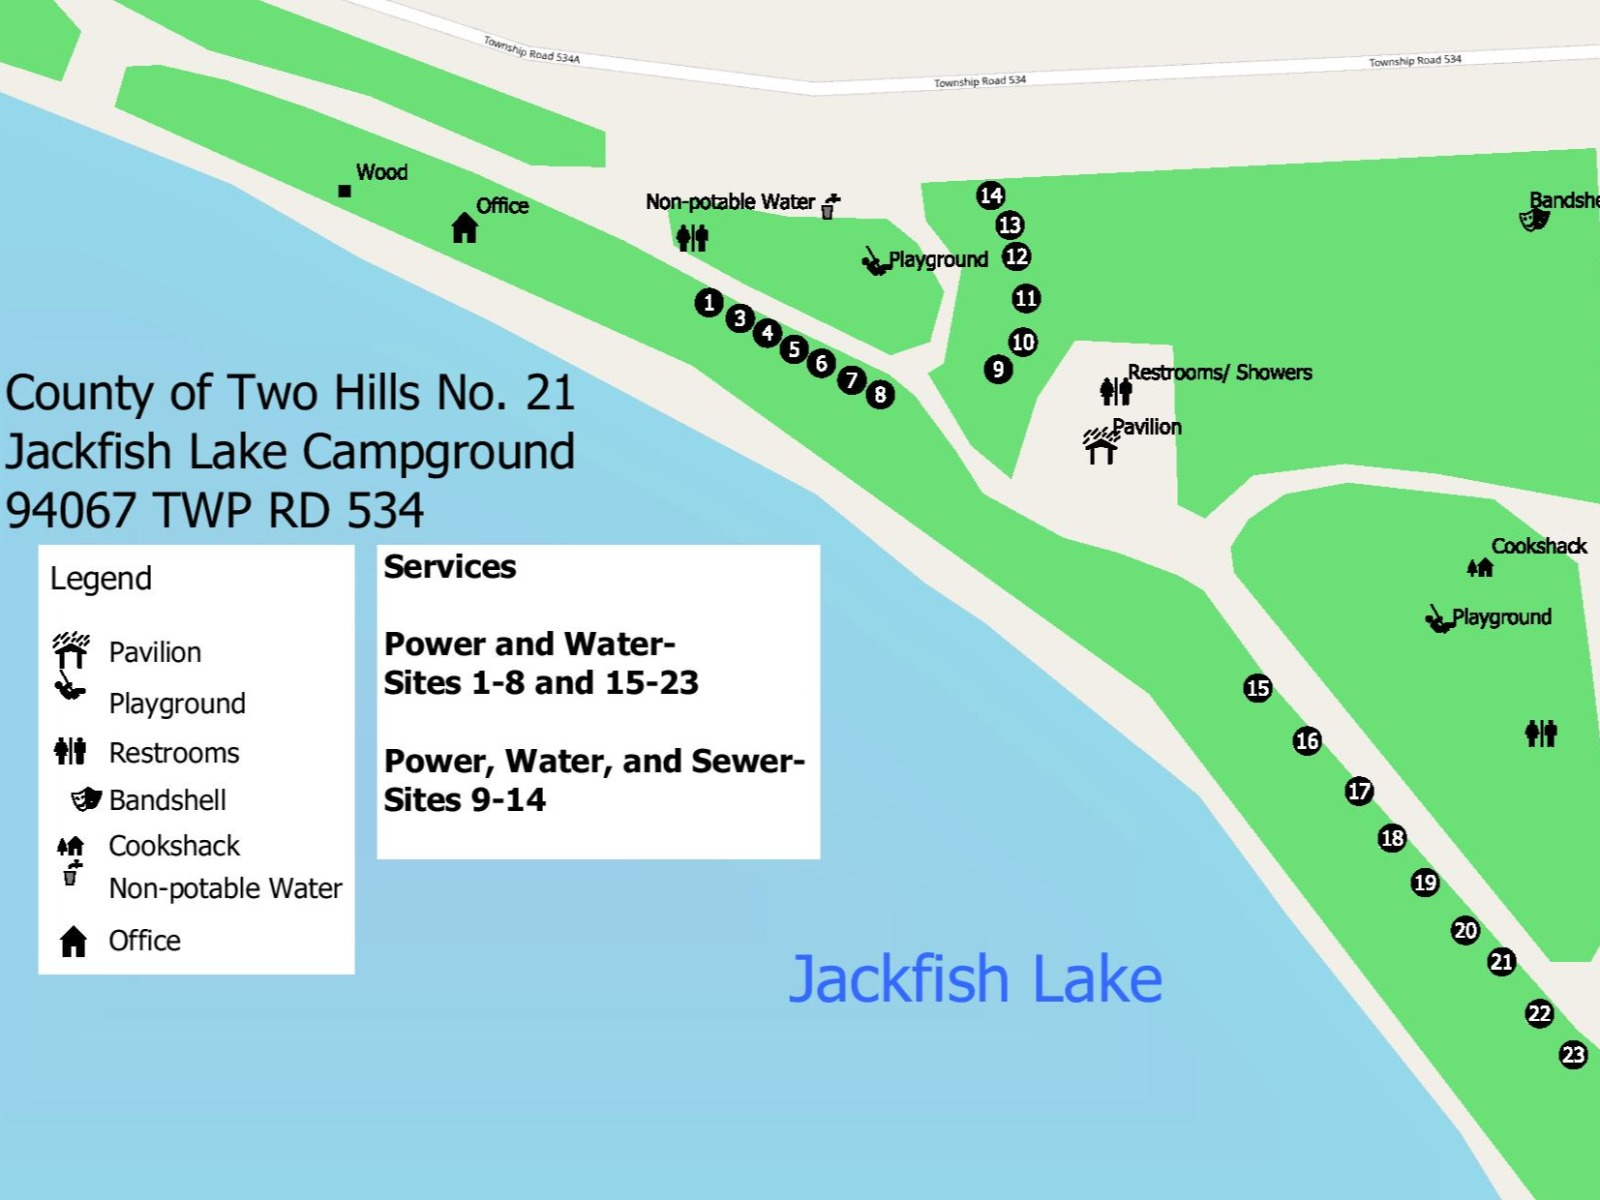 County of Two Hills - Jackfish Lake